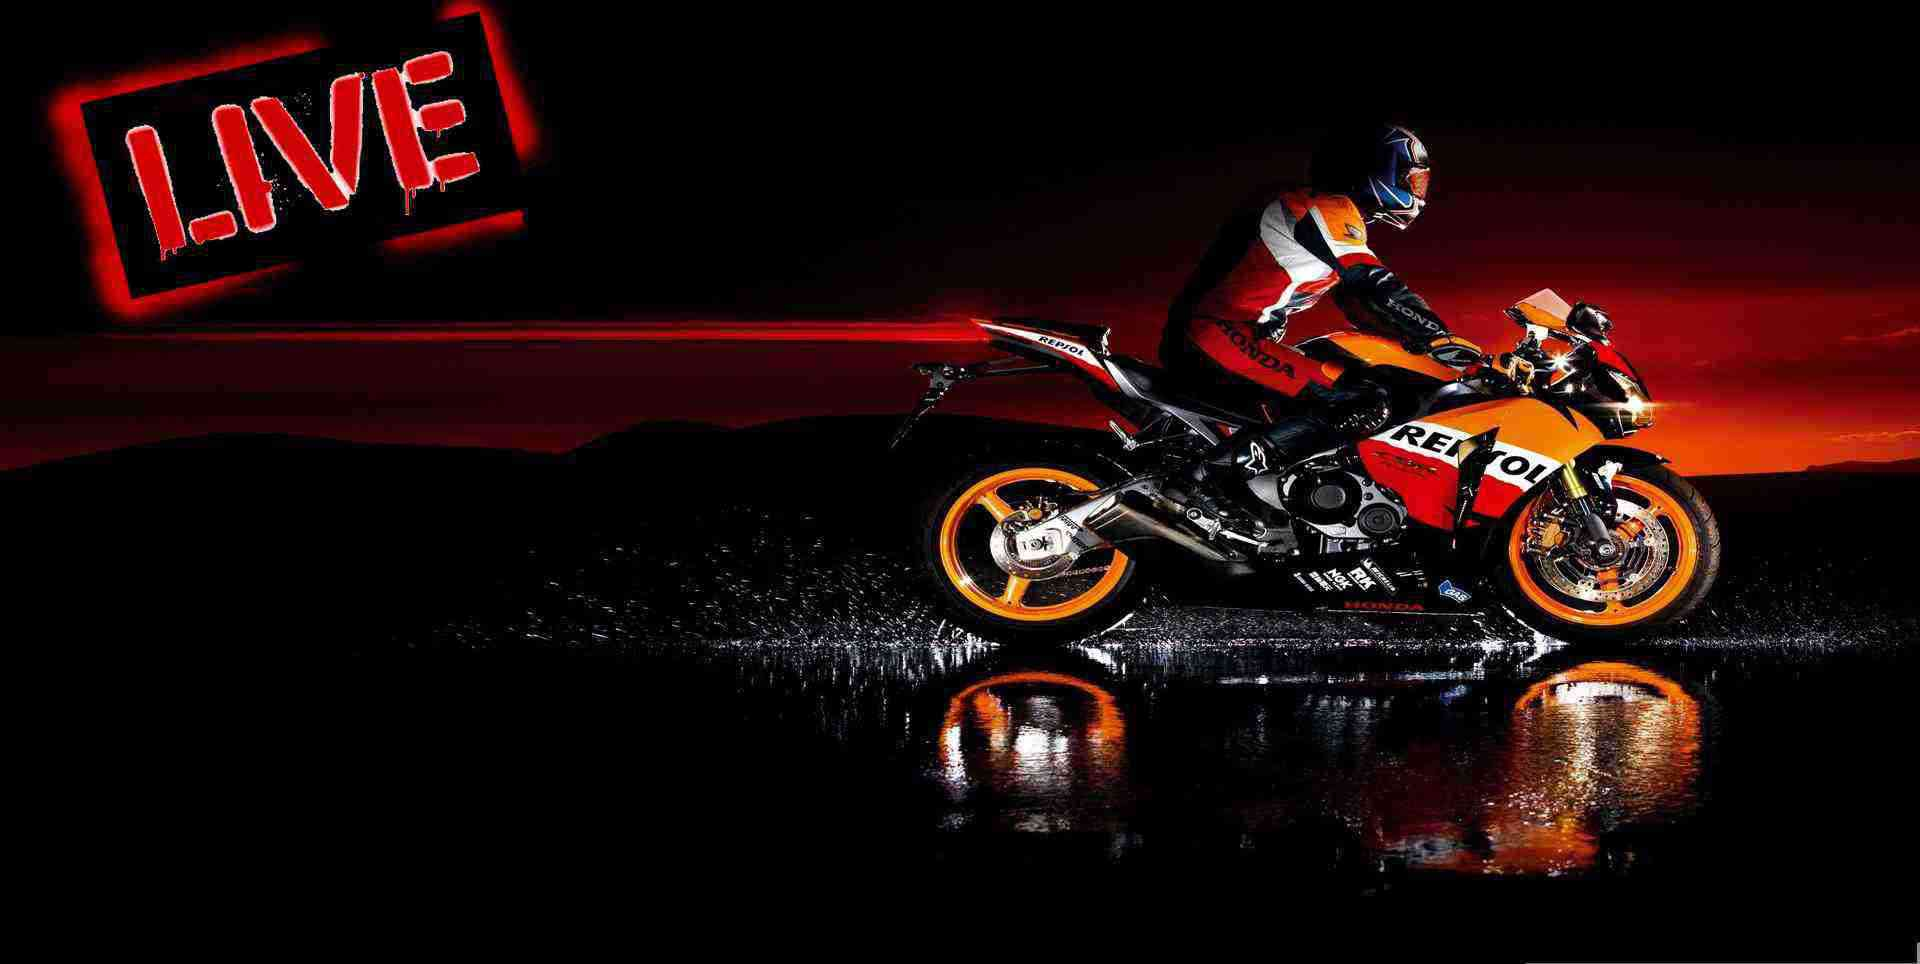 Super Bike 2015 Pirelli Spanish Round 11 Live Telecast